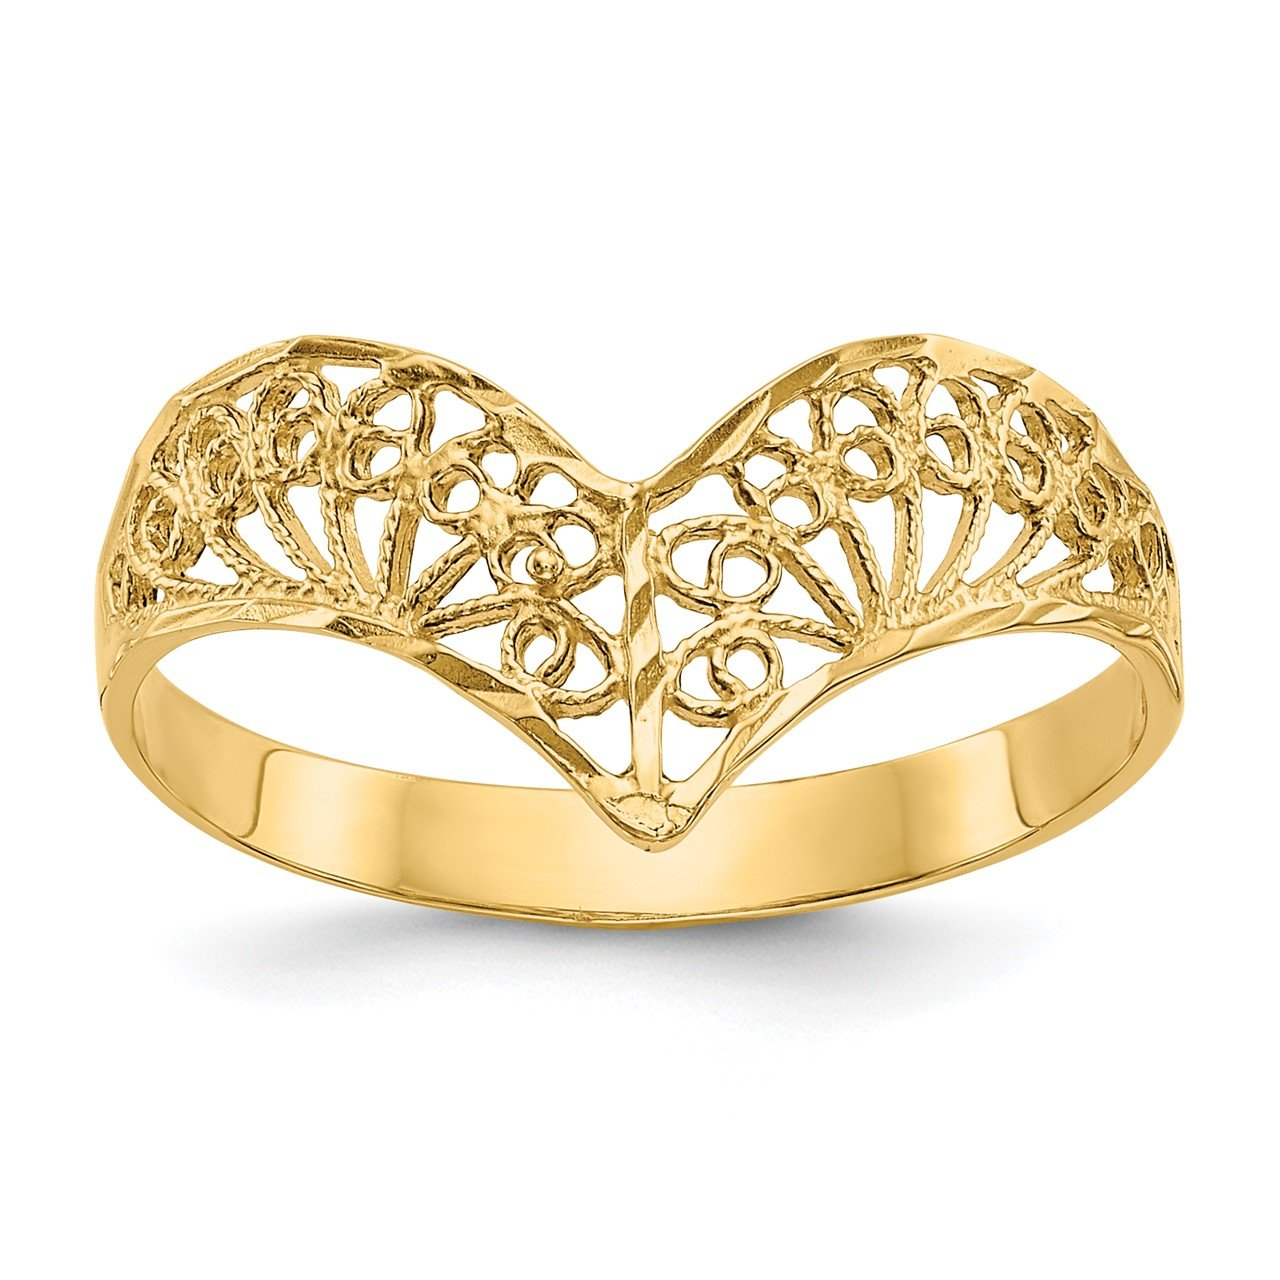 14k Diamond-Cut Filigree Ring